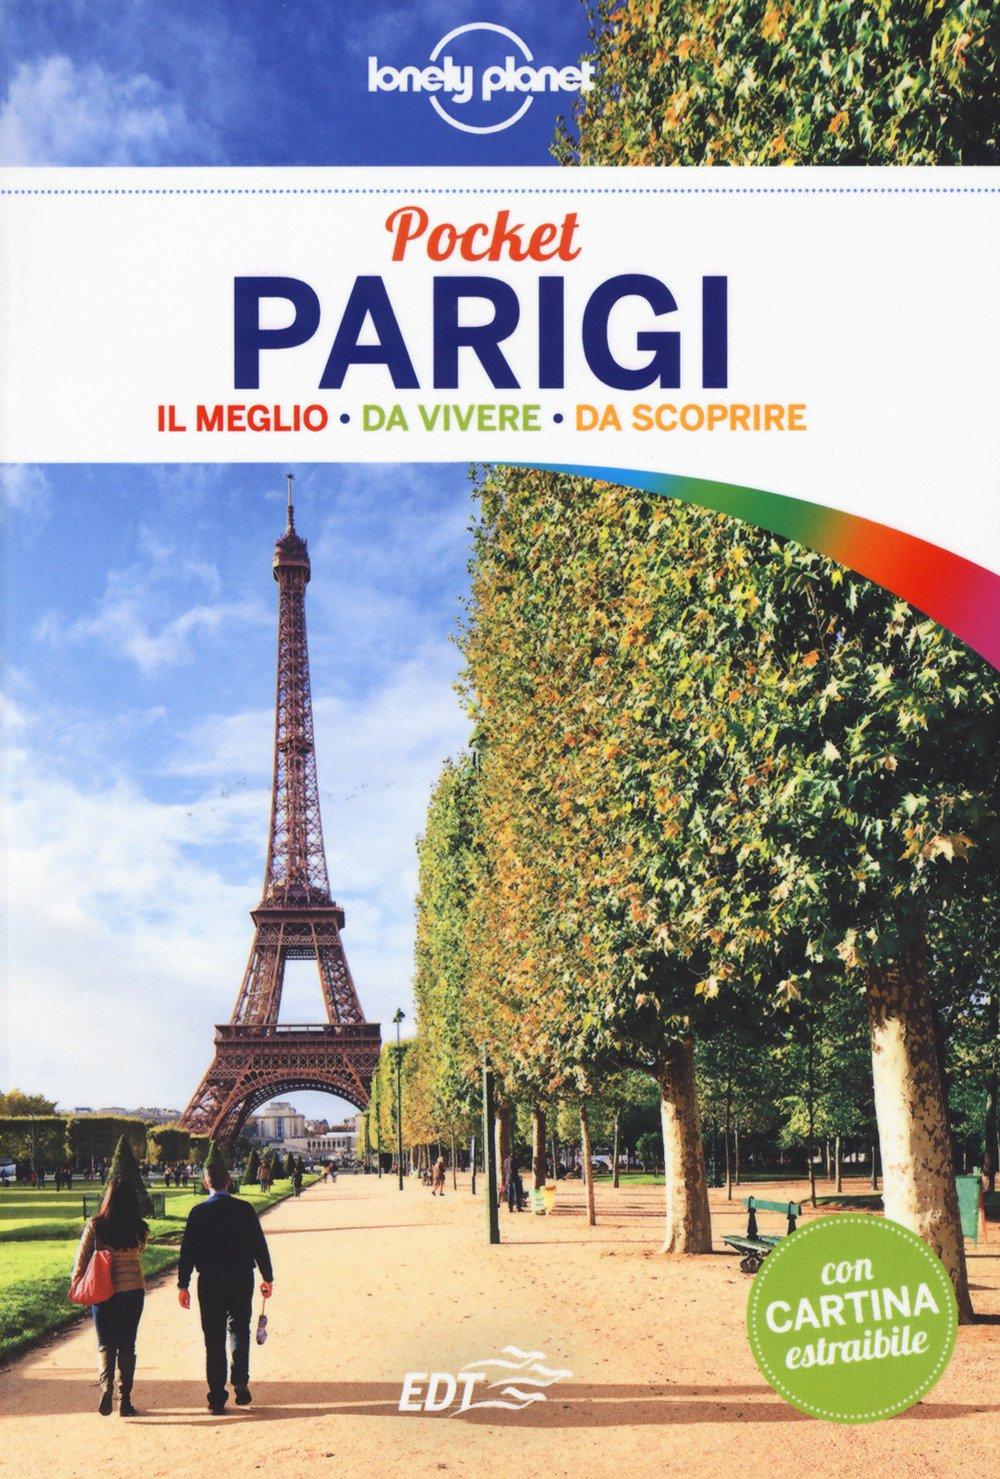 Parigi. Con carta estraibile Copertina flessibile – 18 mag 2017 Catherine Le Nevez C. Dapino EDT 8859238390